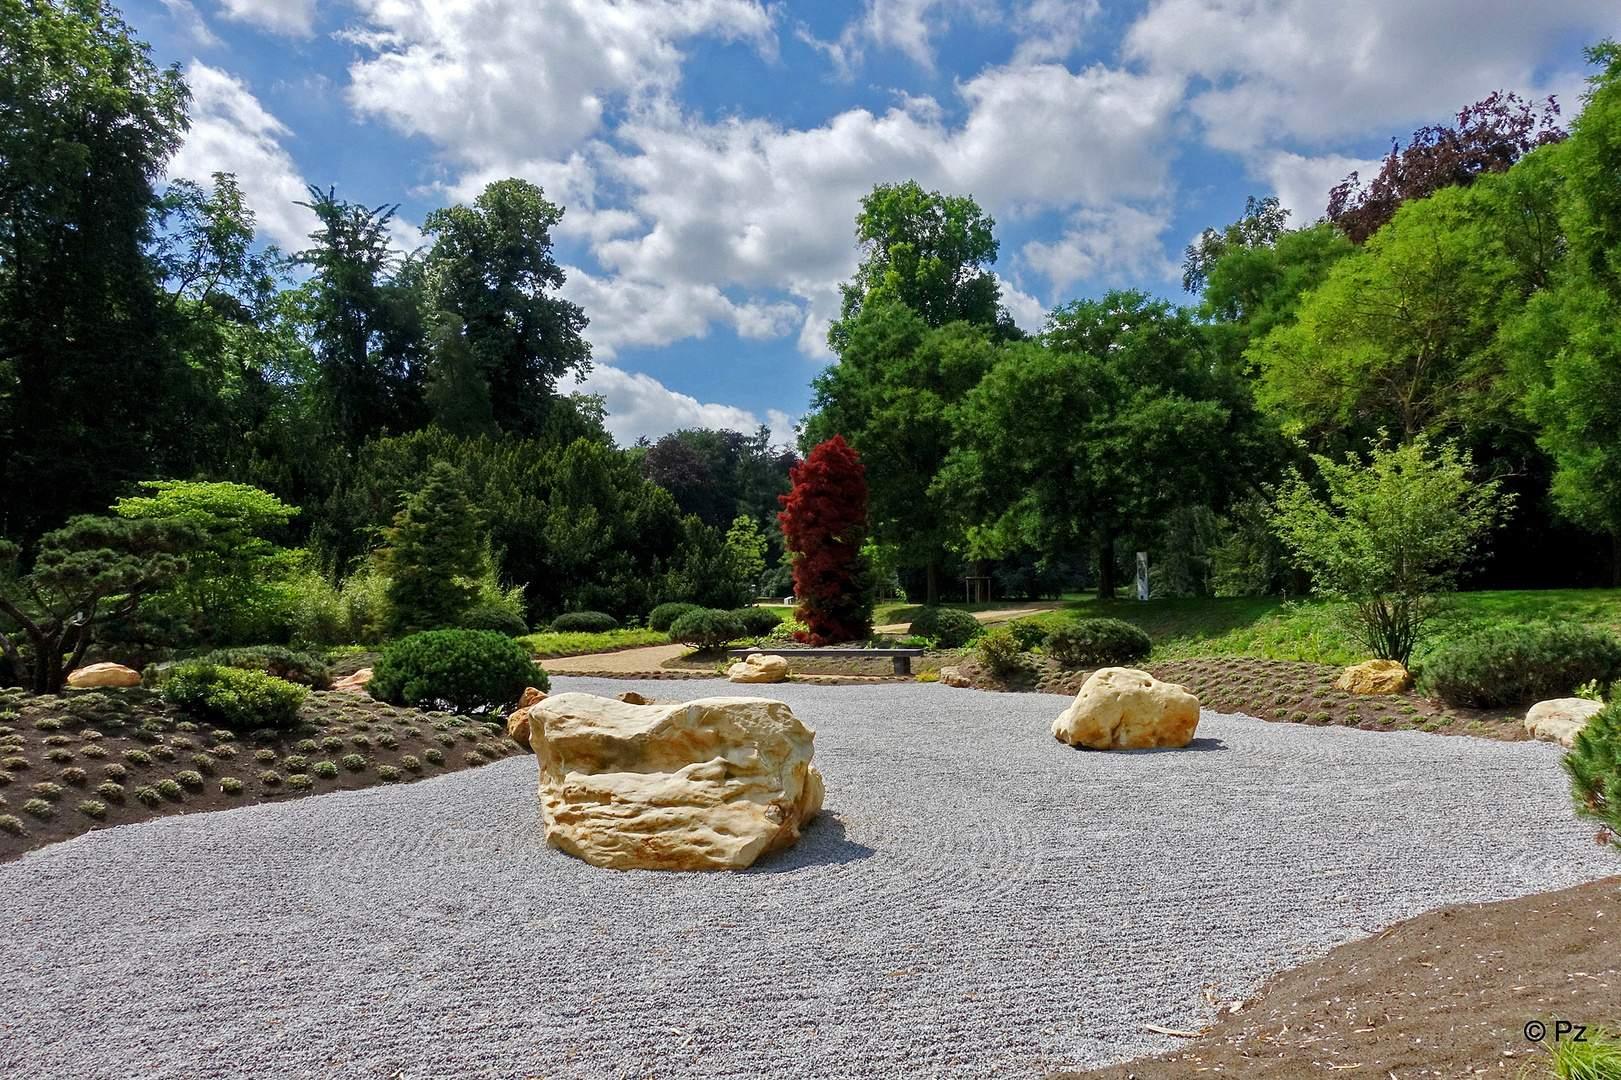 Zen Garten Elegant Schloss Dyck Im Zen Garten Foto & Bild